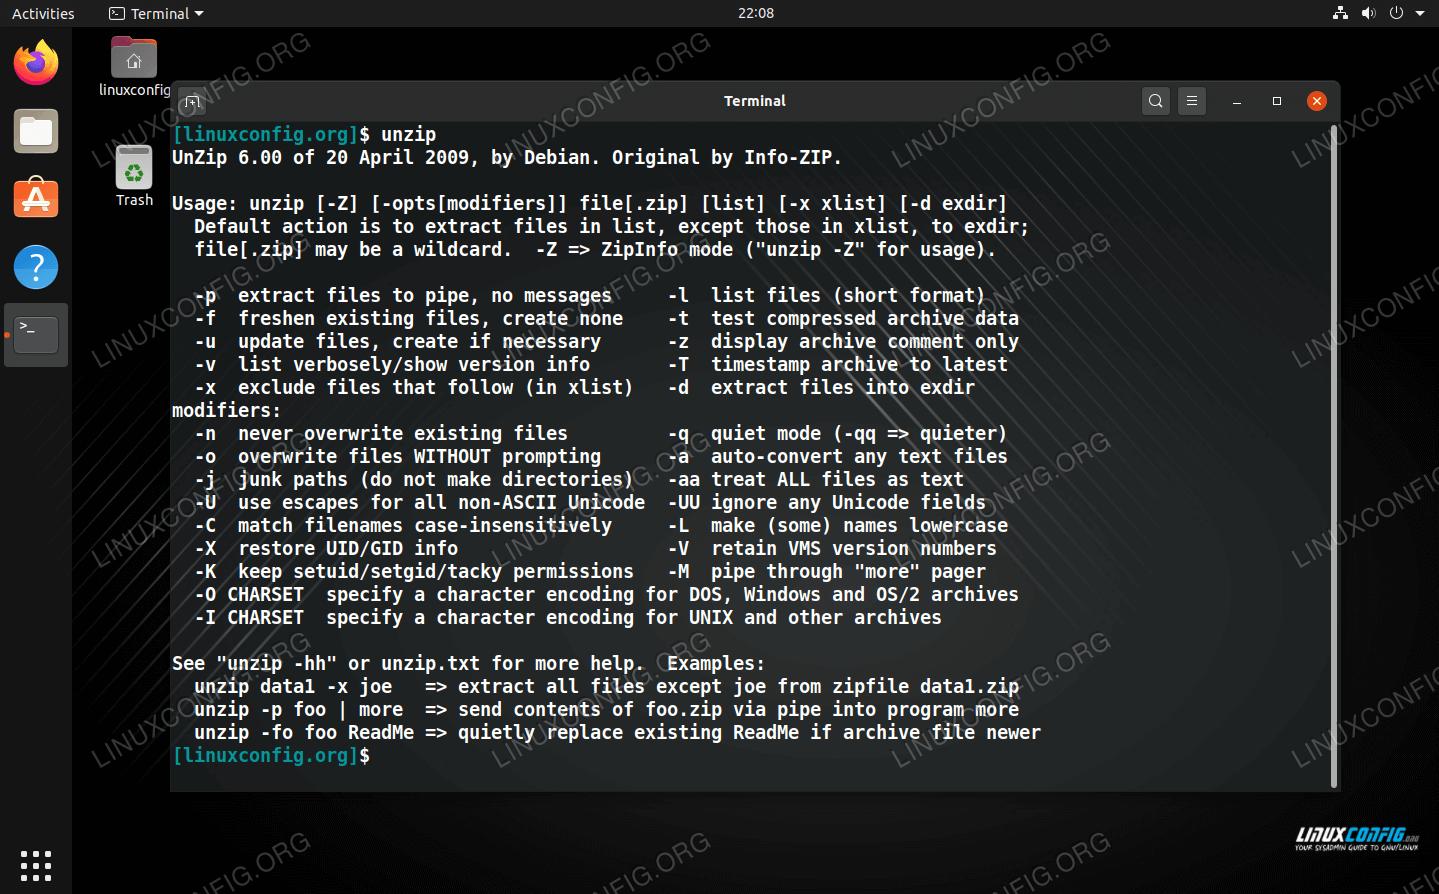 Unzip command on Linux